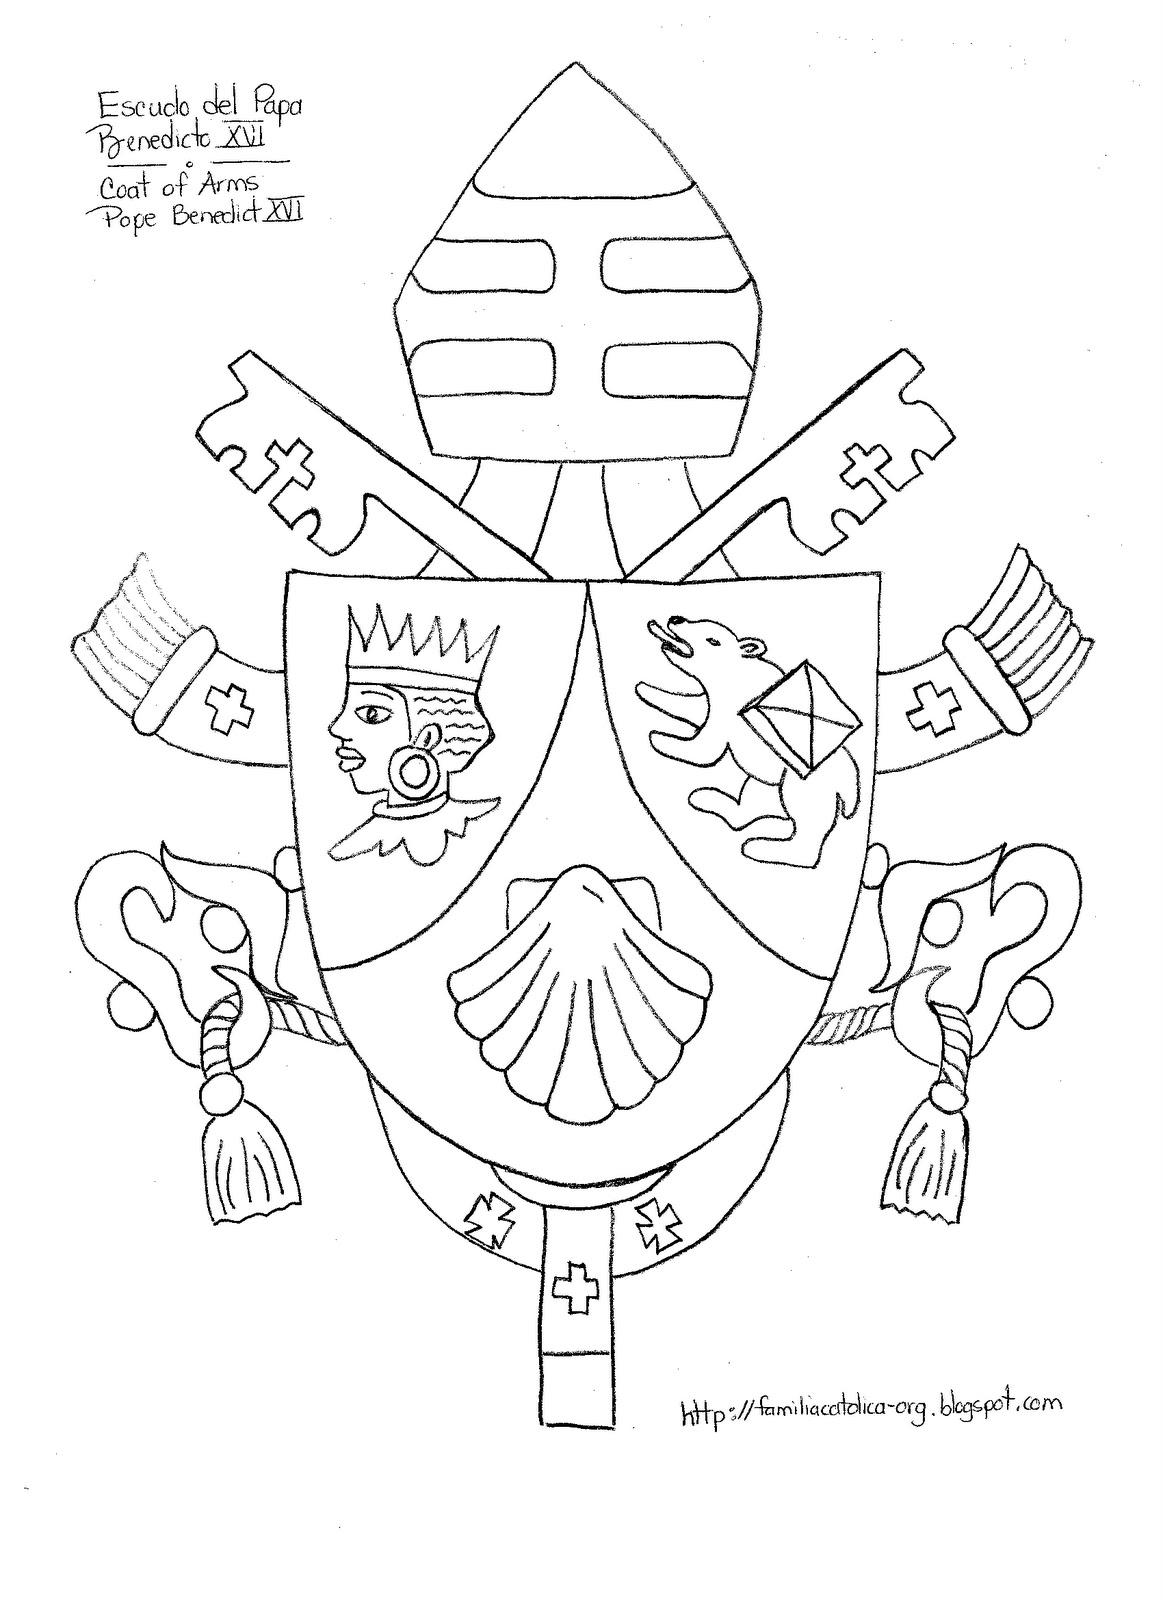 Excelente Página Para Colorear De Escudo De Fe Ornamento - Dibujos ...